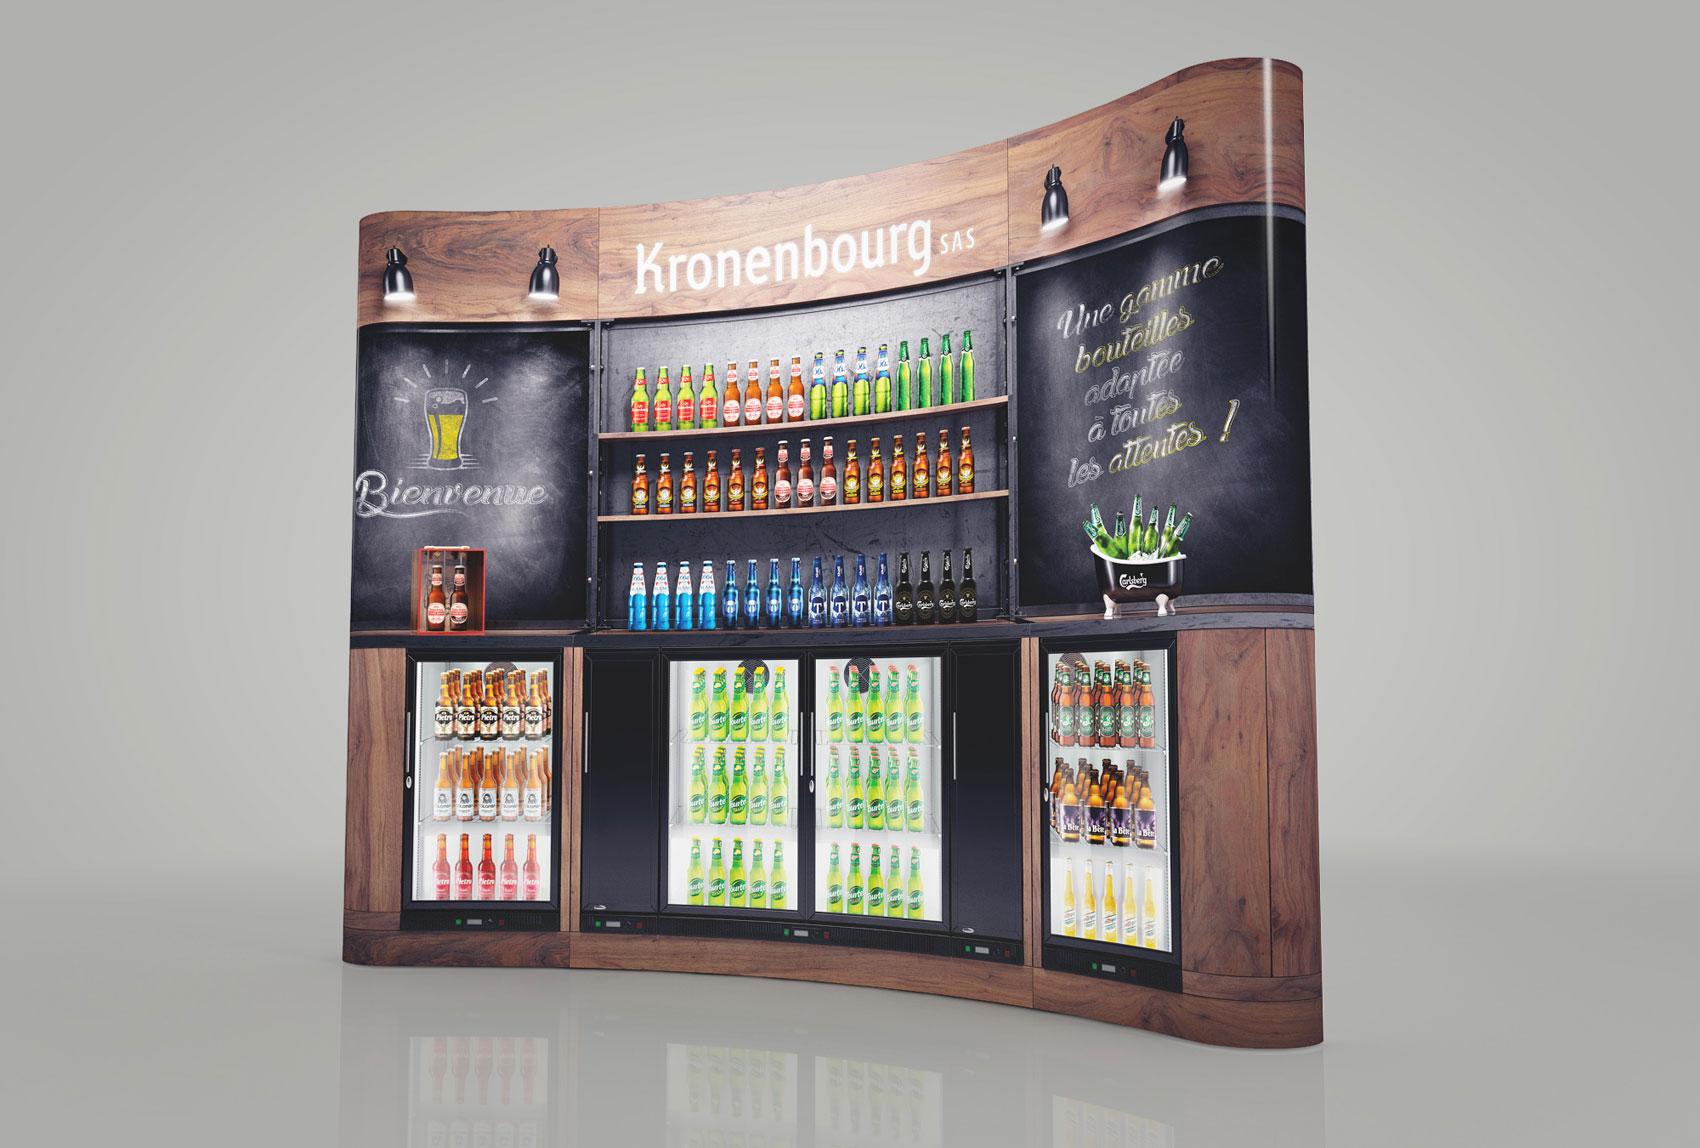 multi-marques-kronenbourg-8